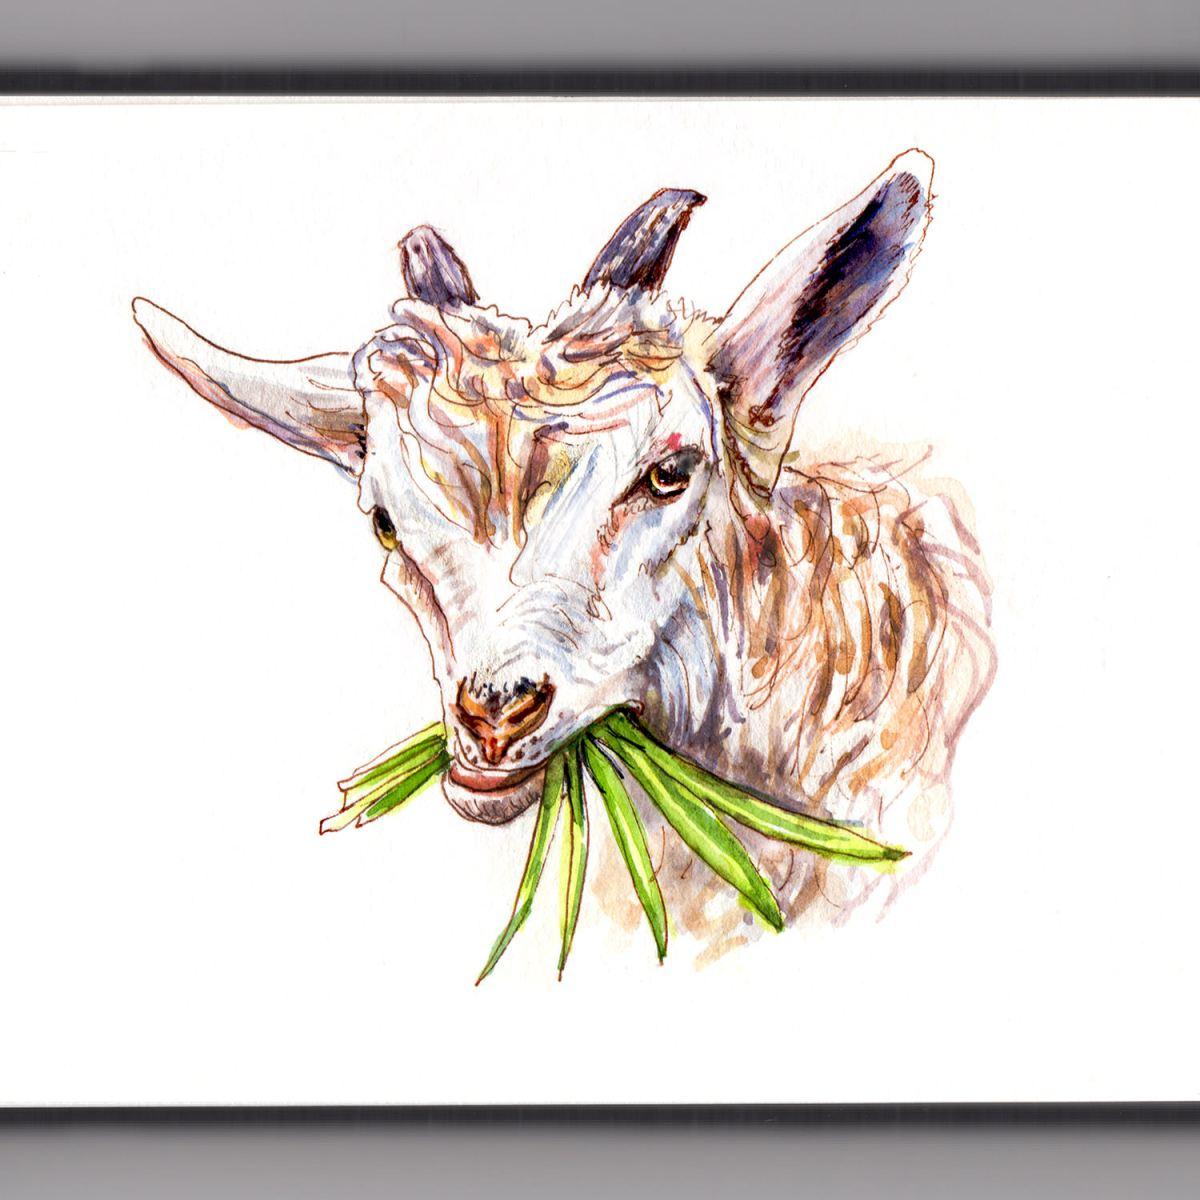 DoodlewashR Like A Goat Eating Grass